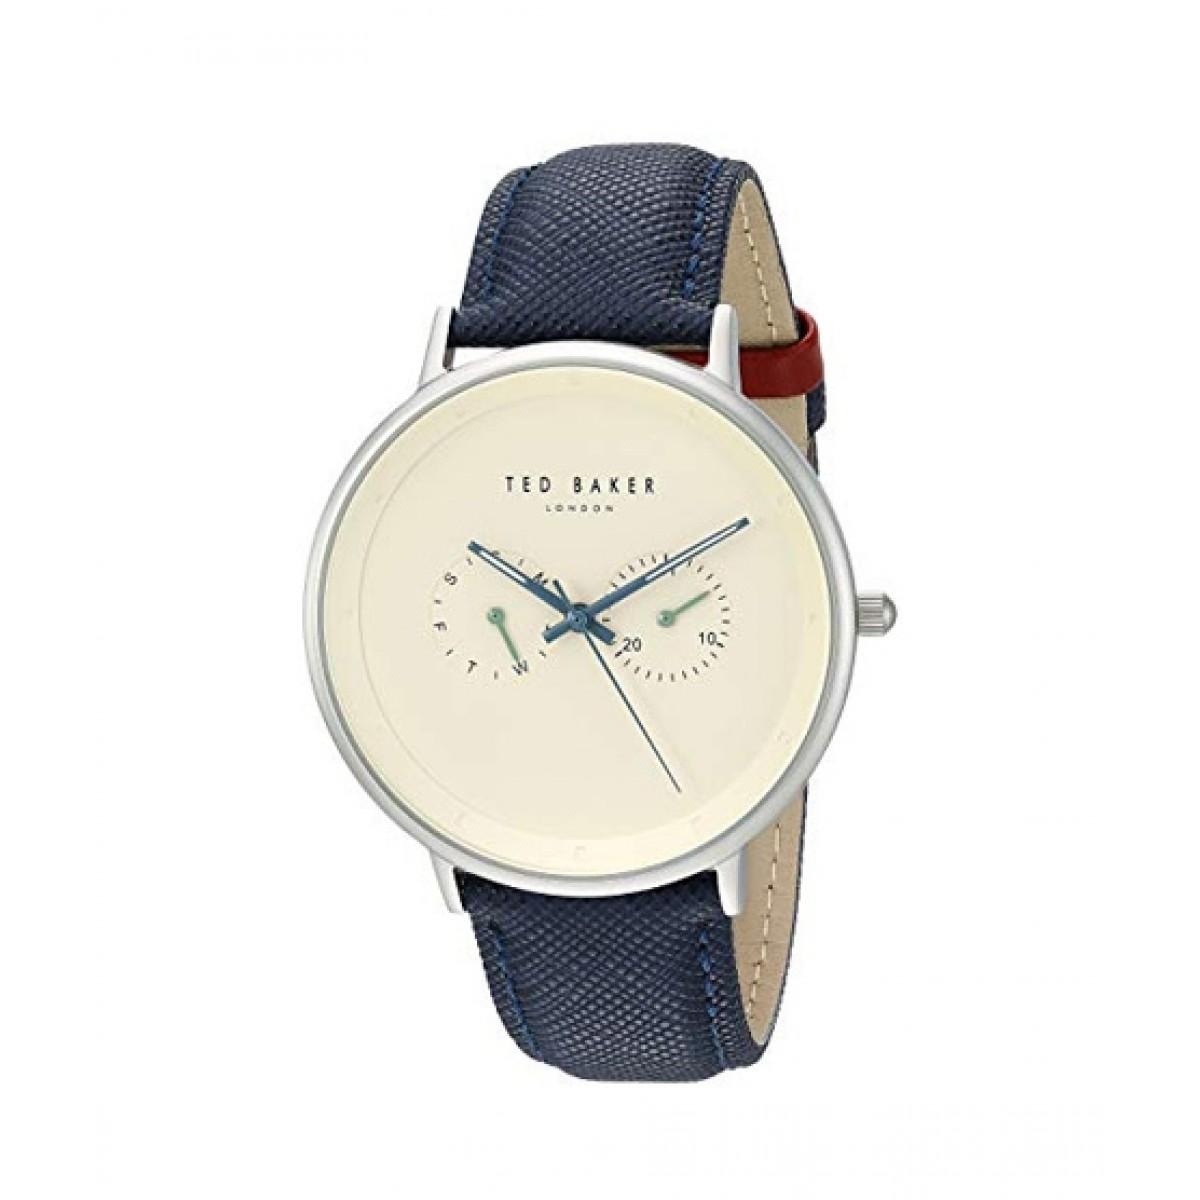 a3ebe0479 Ted Baker Brad Men s Watch Price in Pakistan